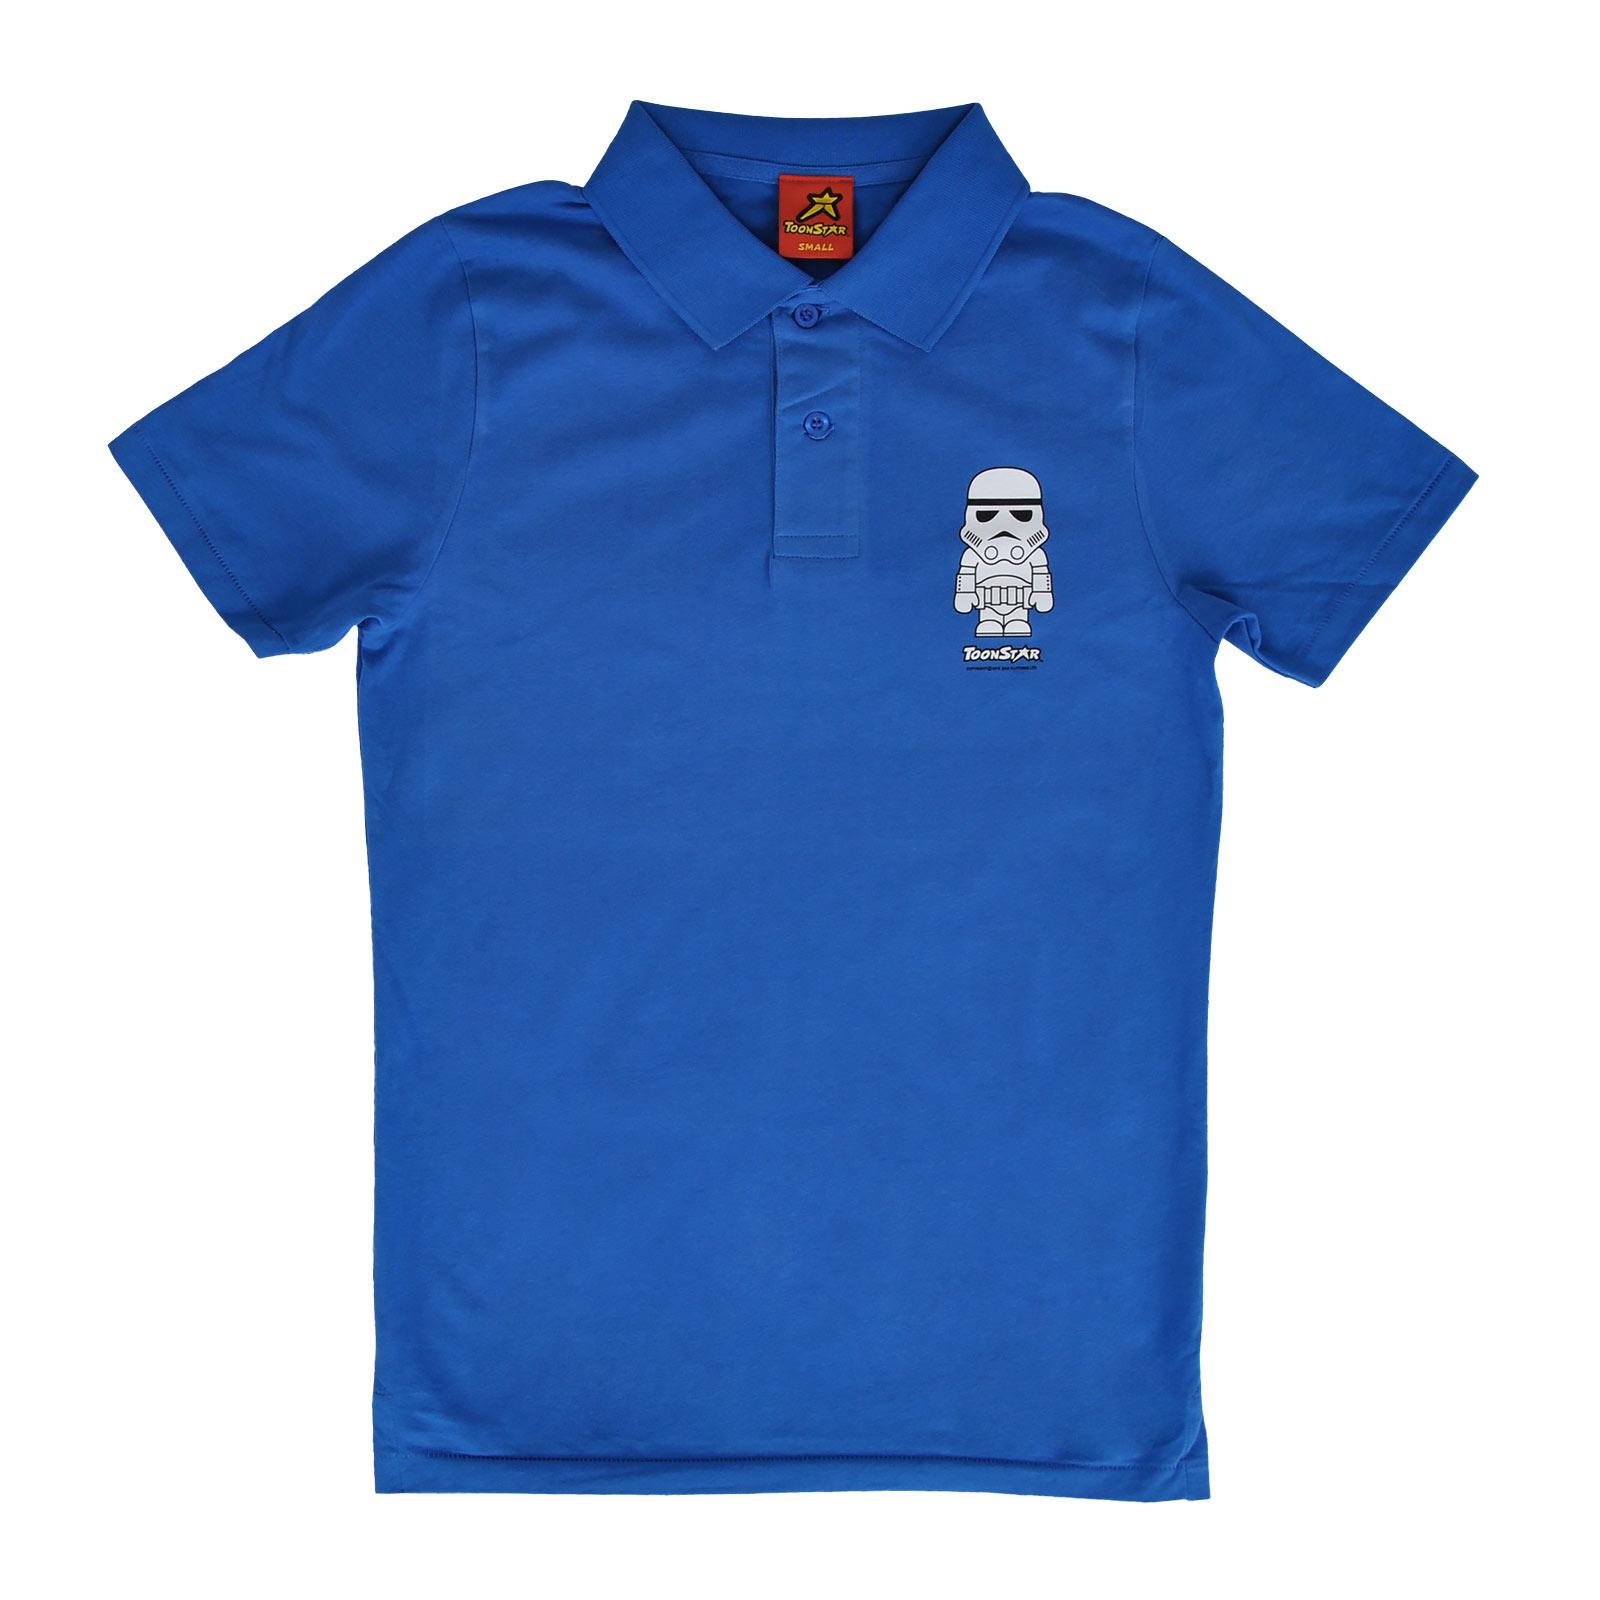 Soldier - Toonstar Cartoon Polo Shirt blau